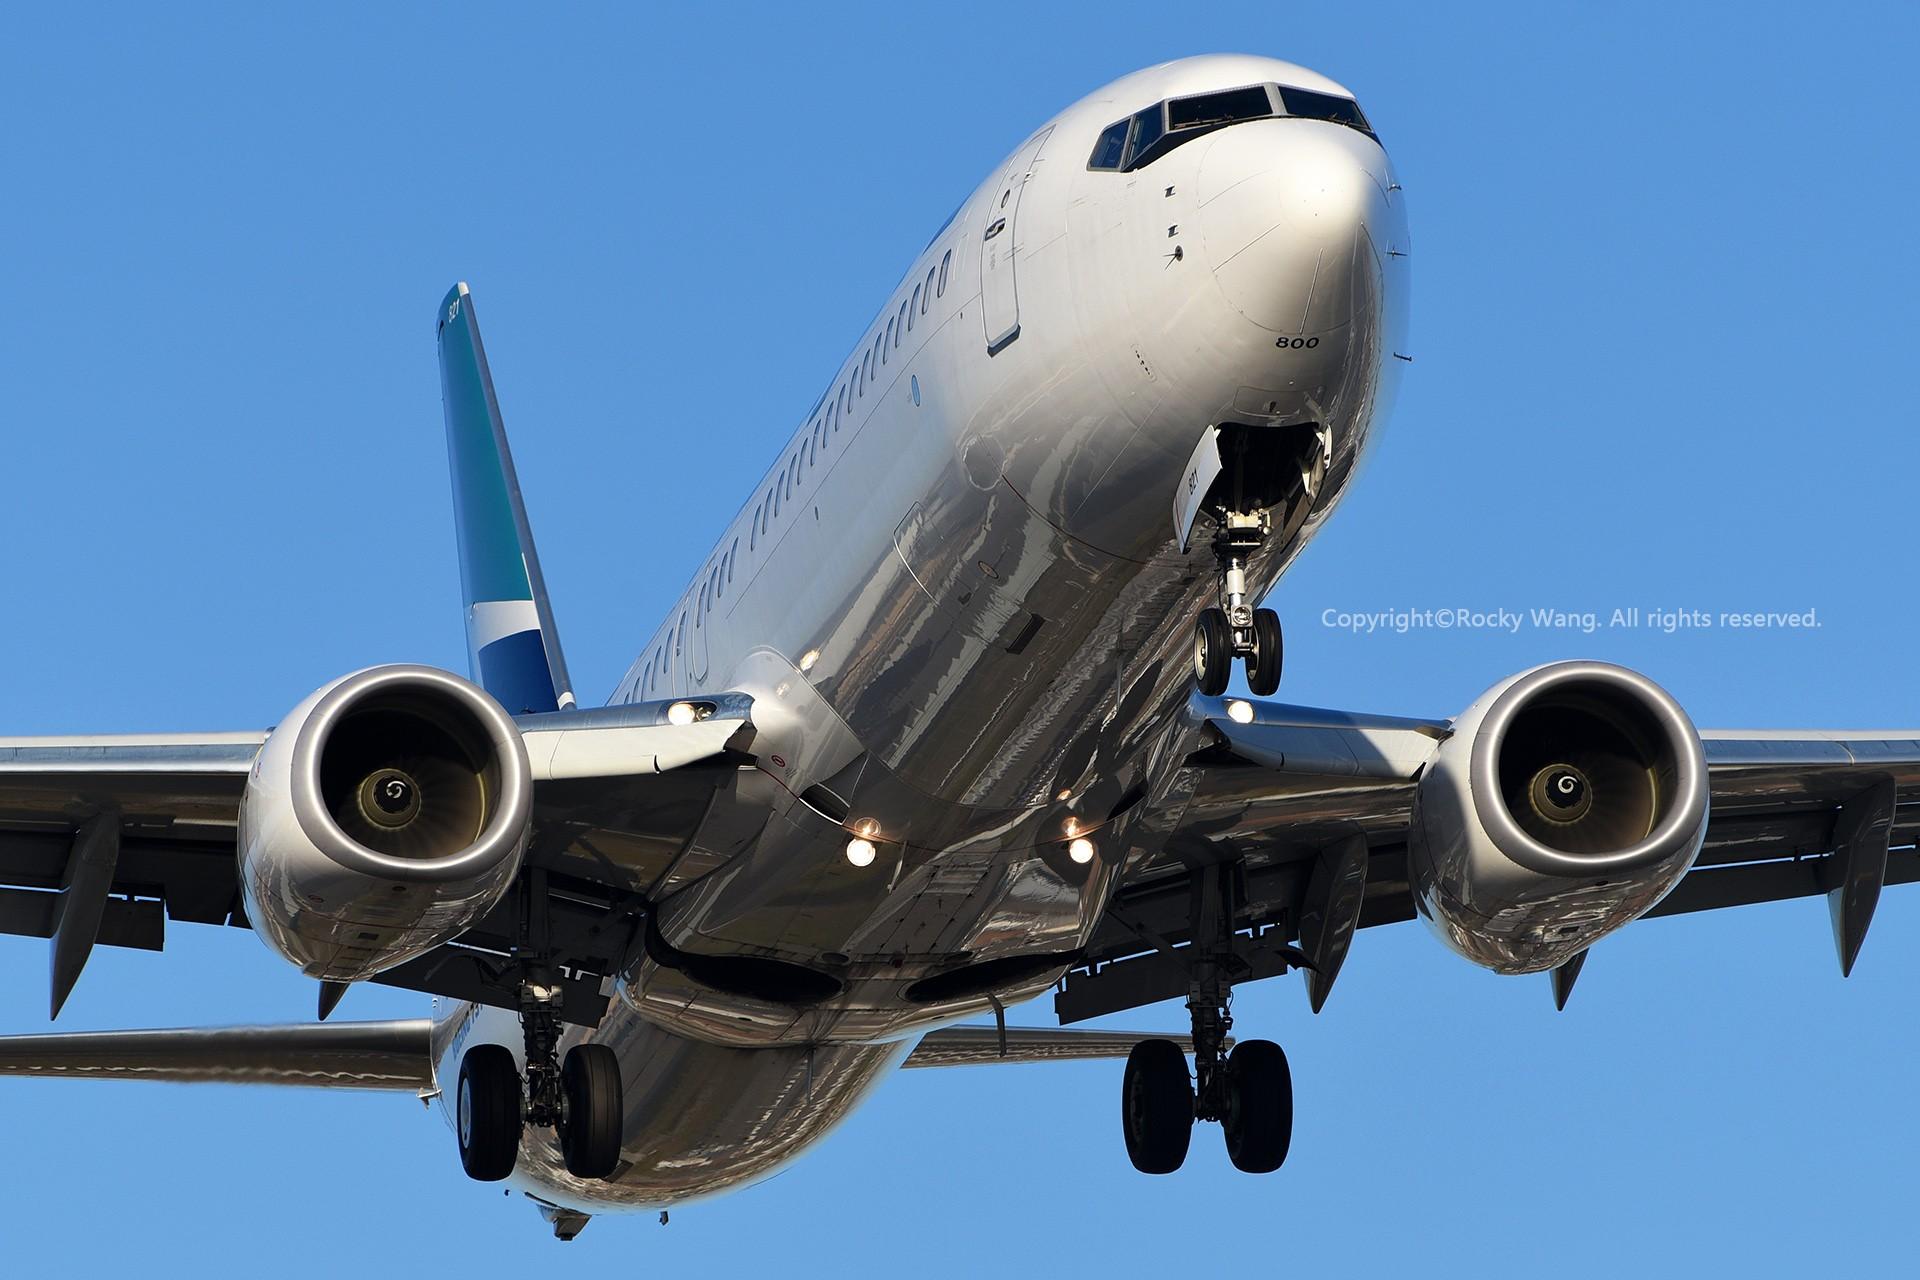 Re:[原创]CYYZ 30图 BOEING 737-8CT C-FRWA Toronto Lester B. Pearson Int'l Airport